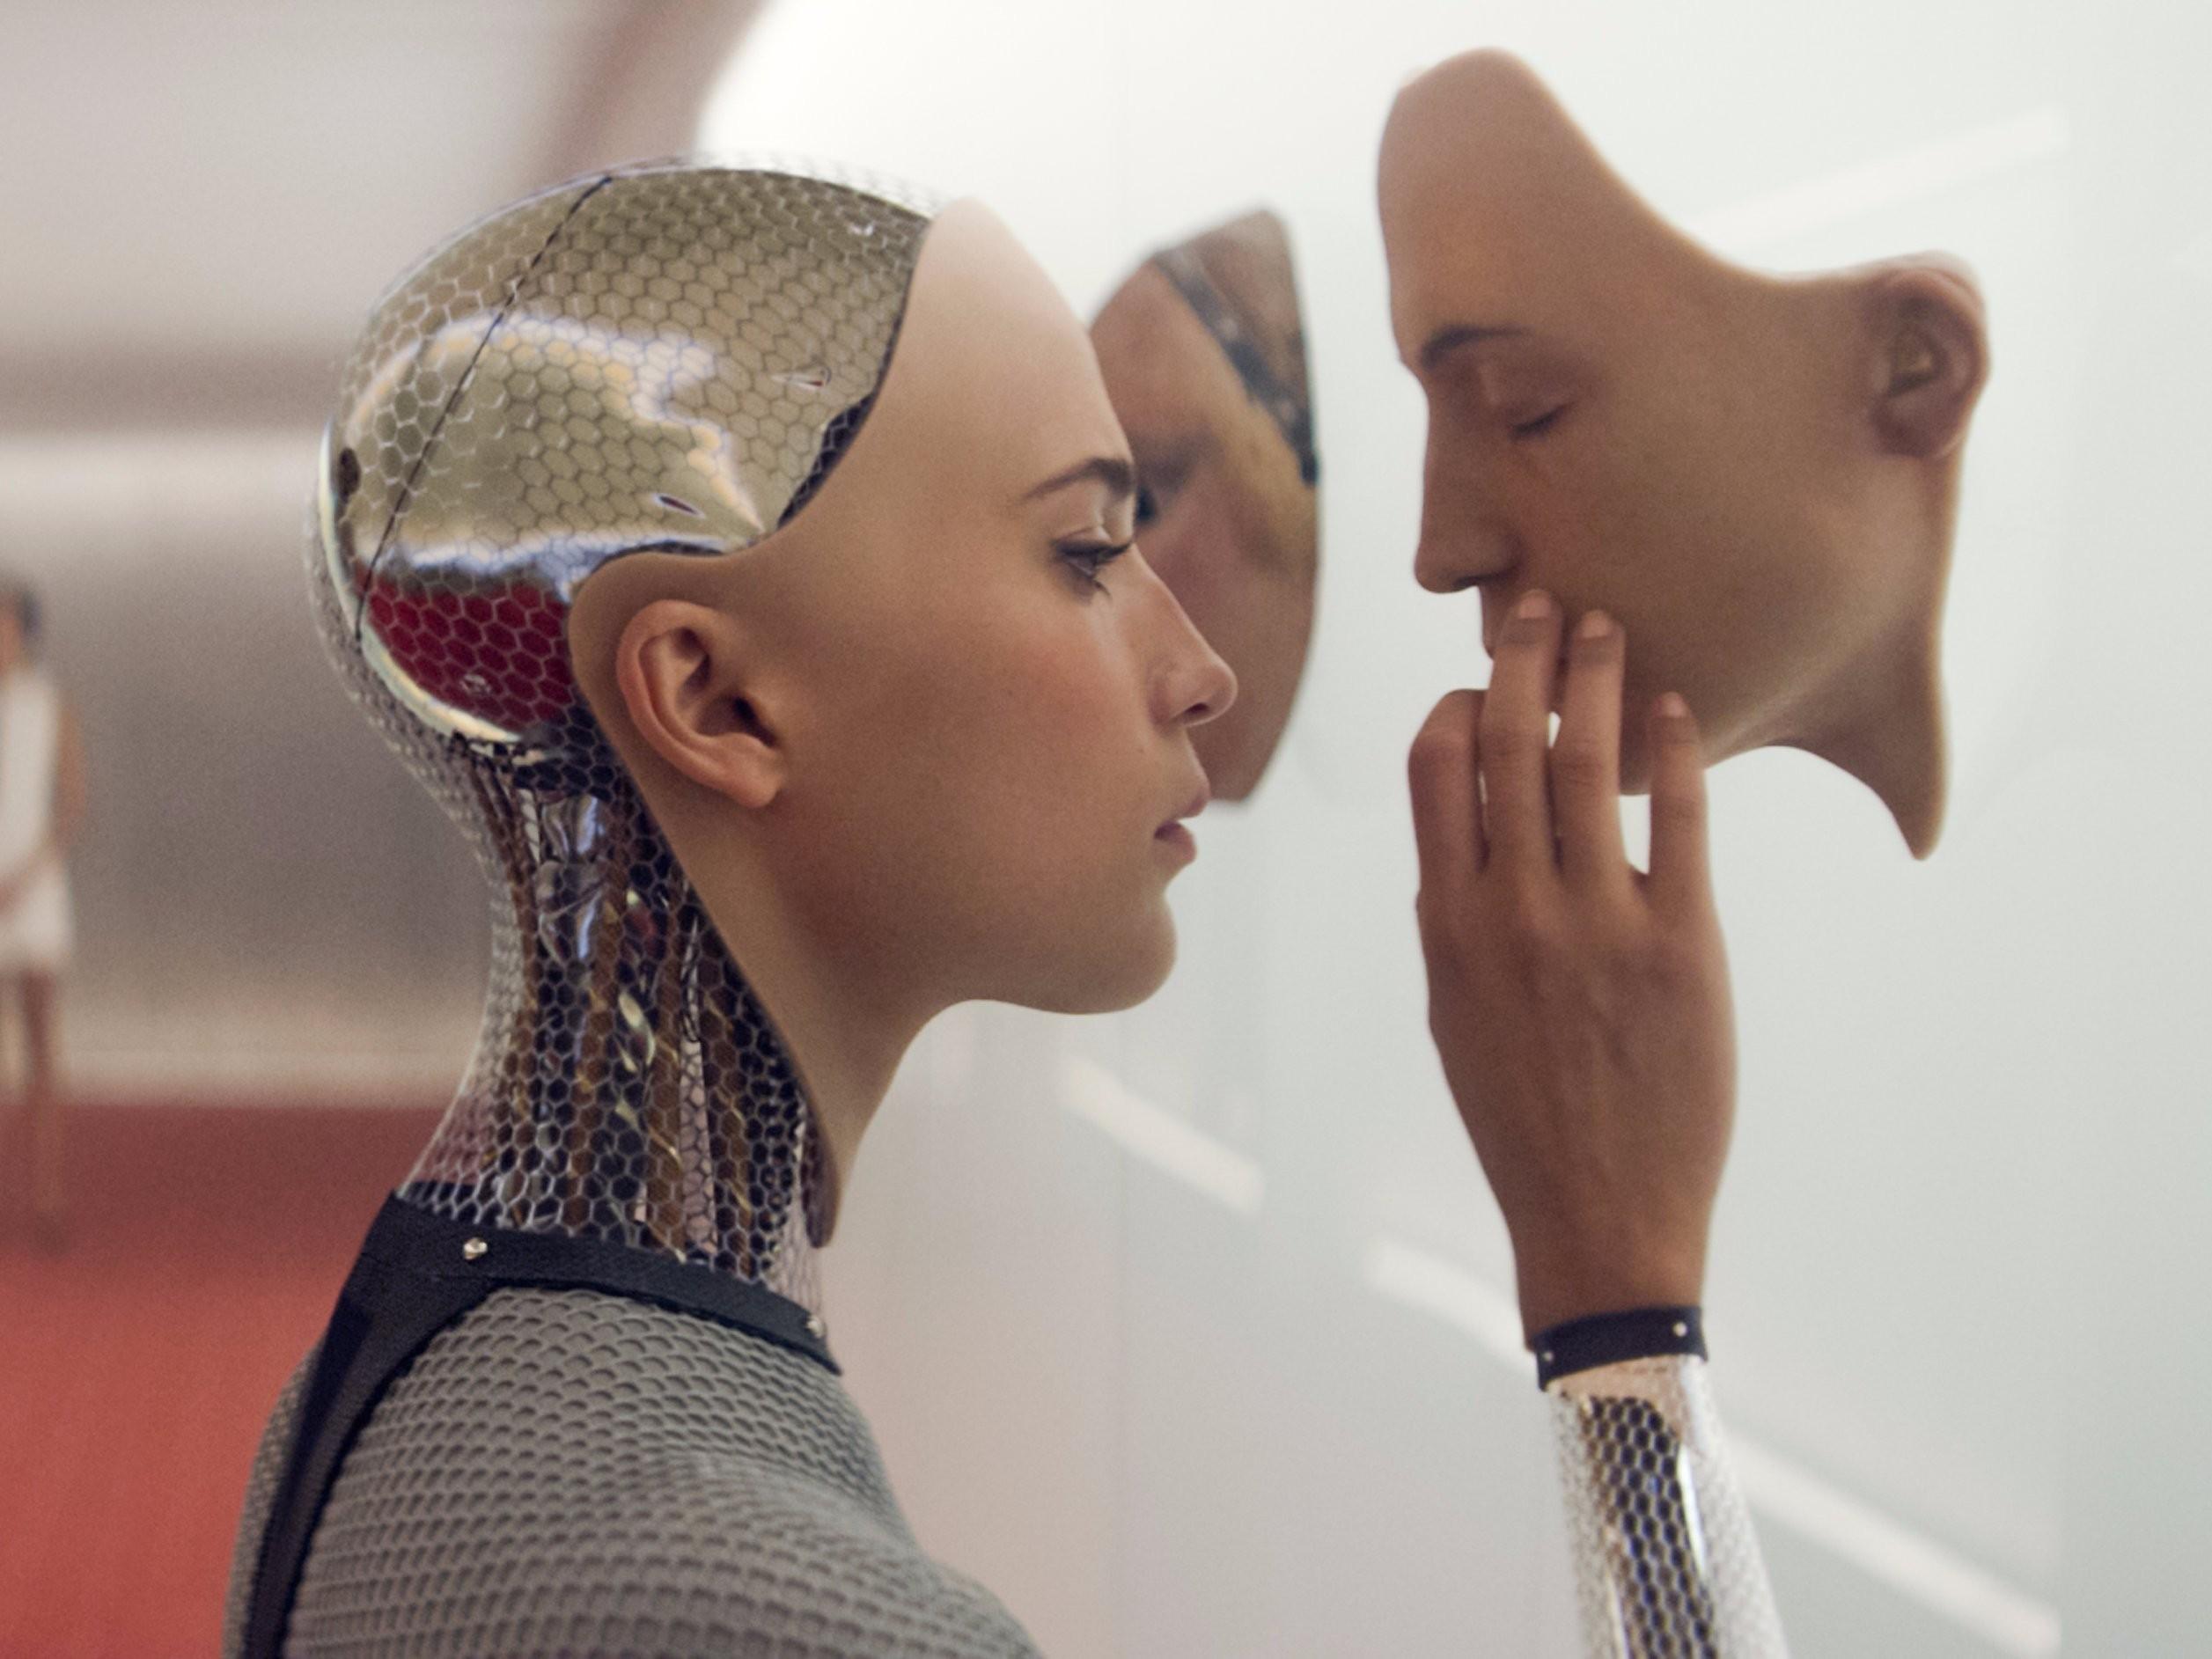 exmachinamovieartificialintelligencerobot.jpg